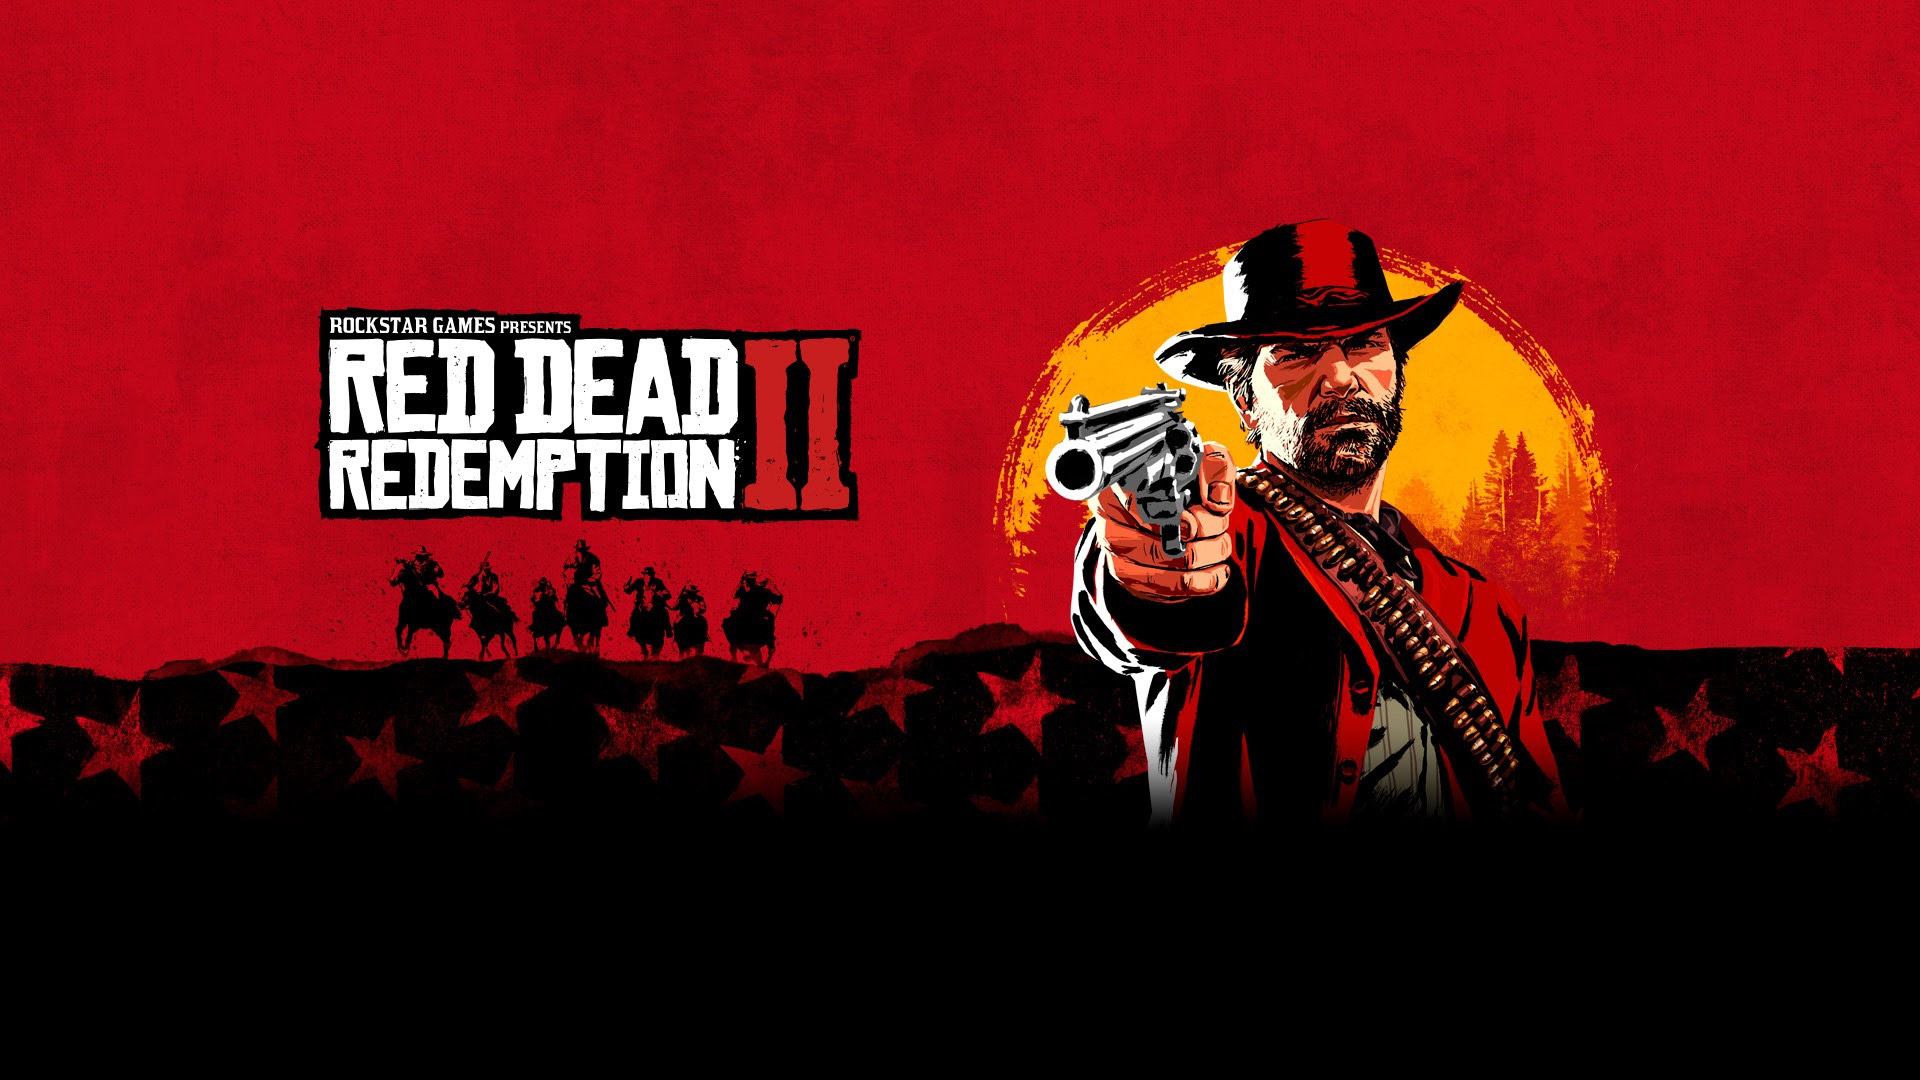 Free Red Dead Redemption 2 Wallpaper in 1920x1080